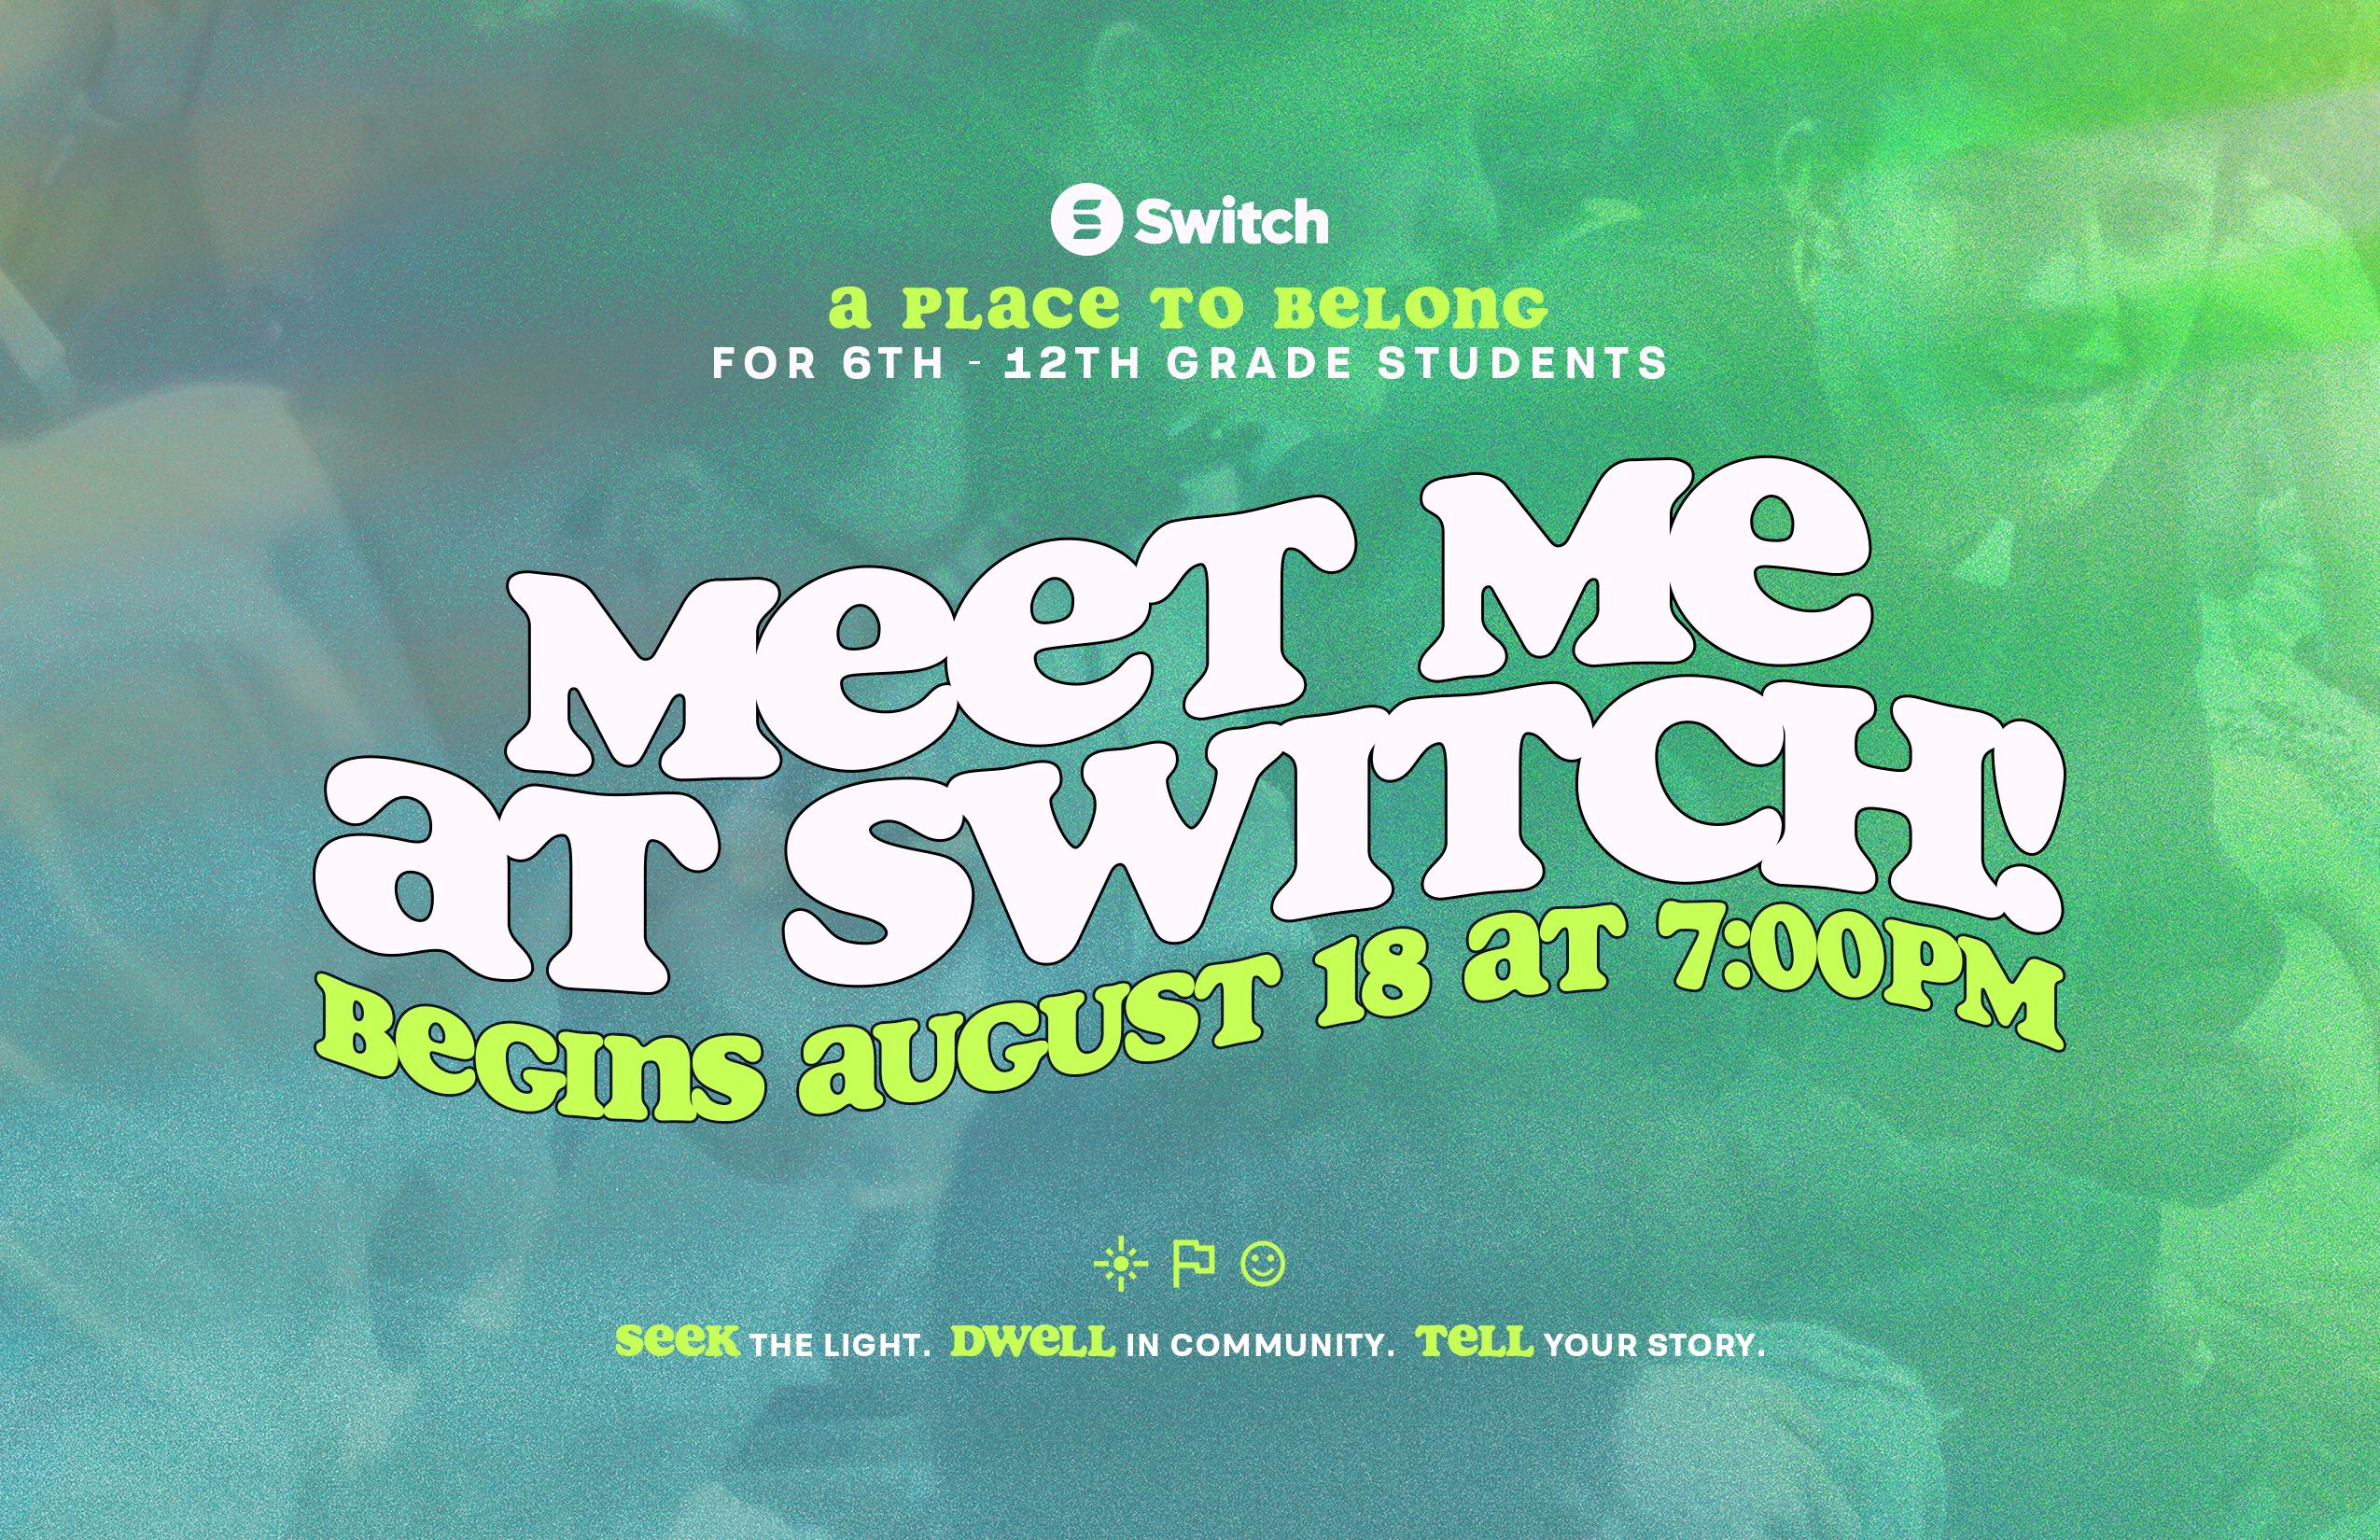 Meet Me at Switch - Half (JPG)